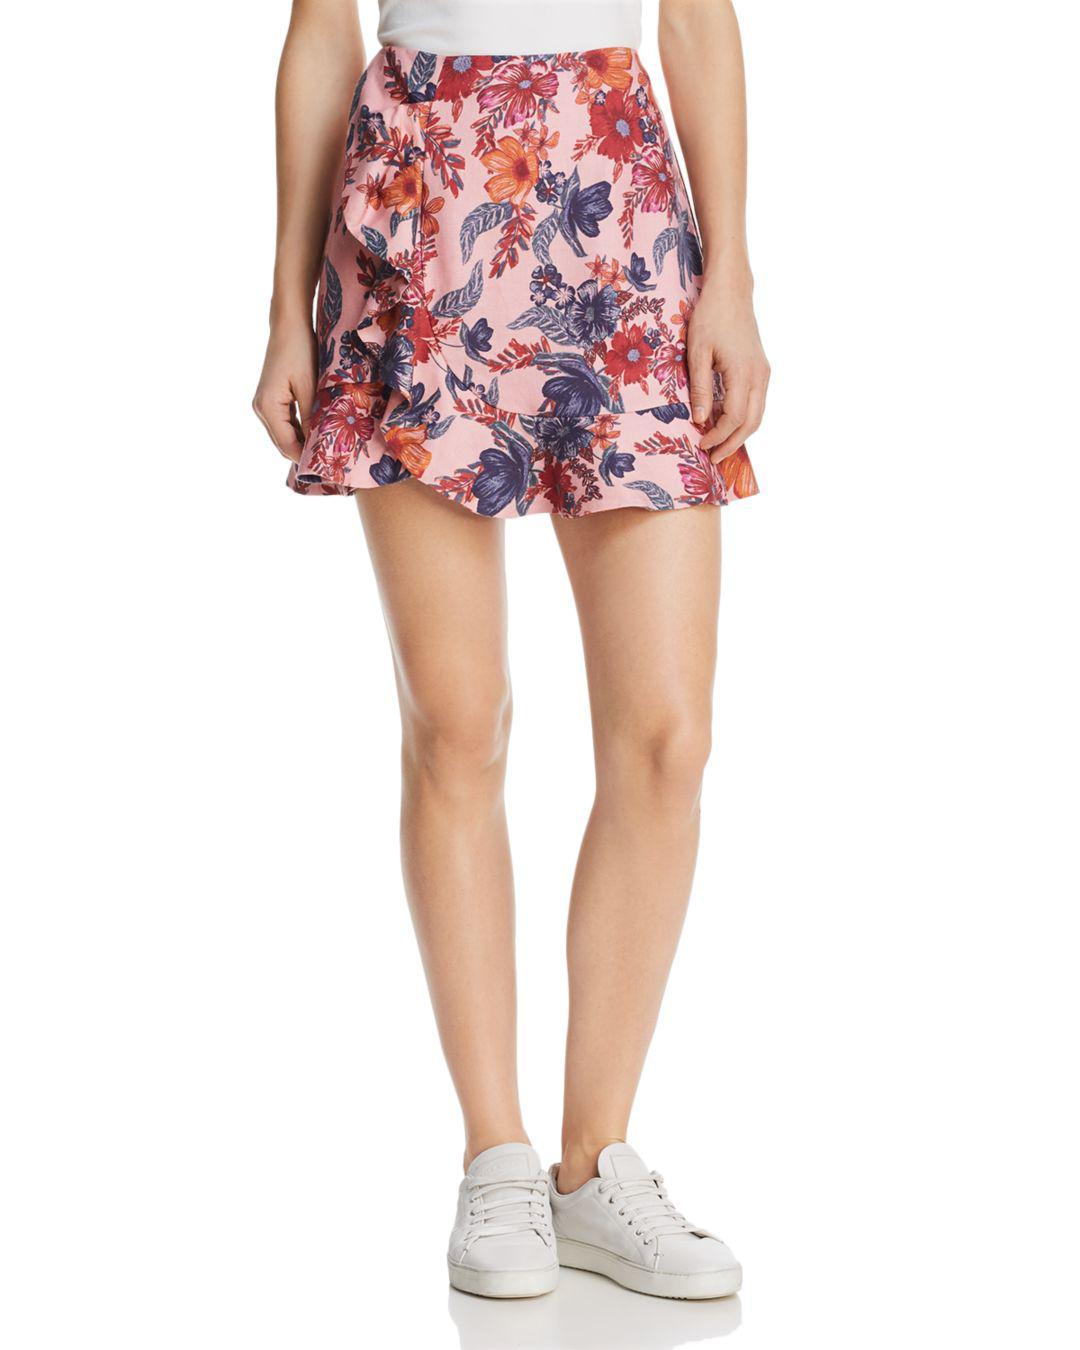 0880ec7710fd Lyst - Finders Keepers Rhapsody Mini Skirt